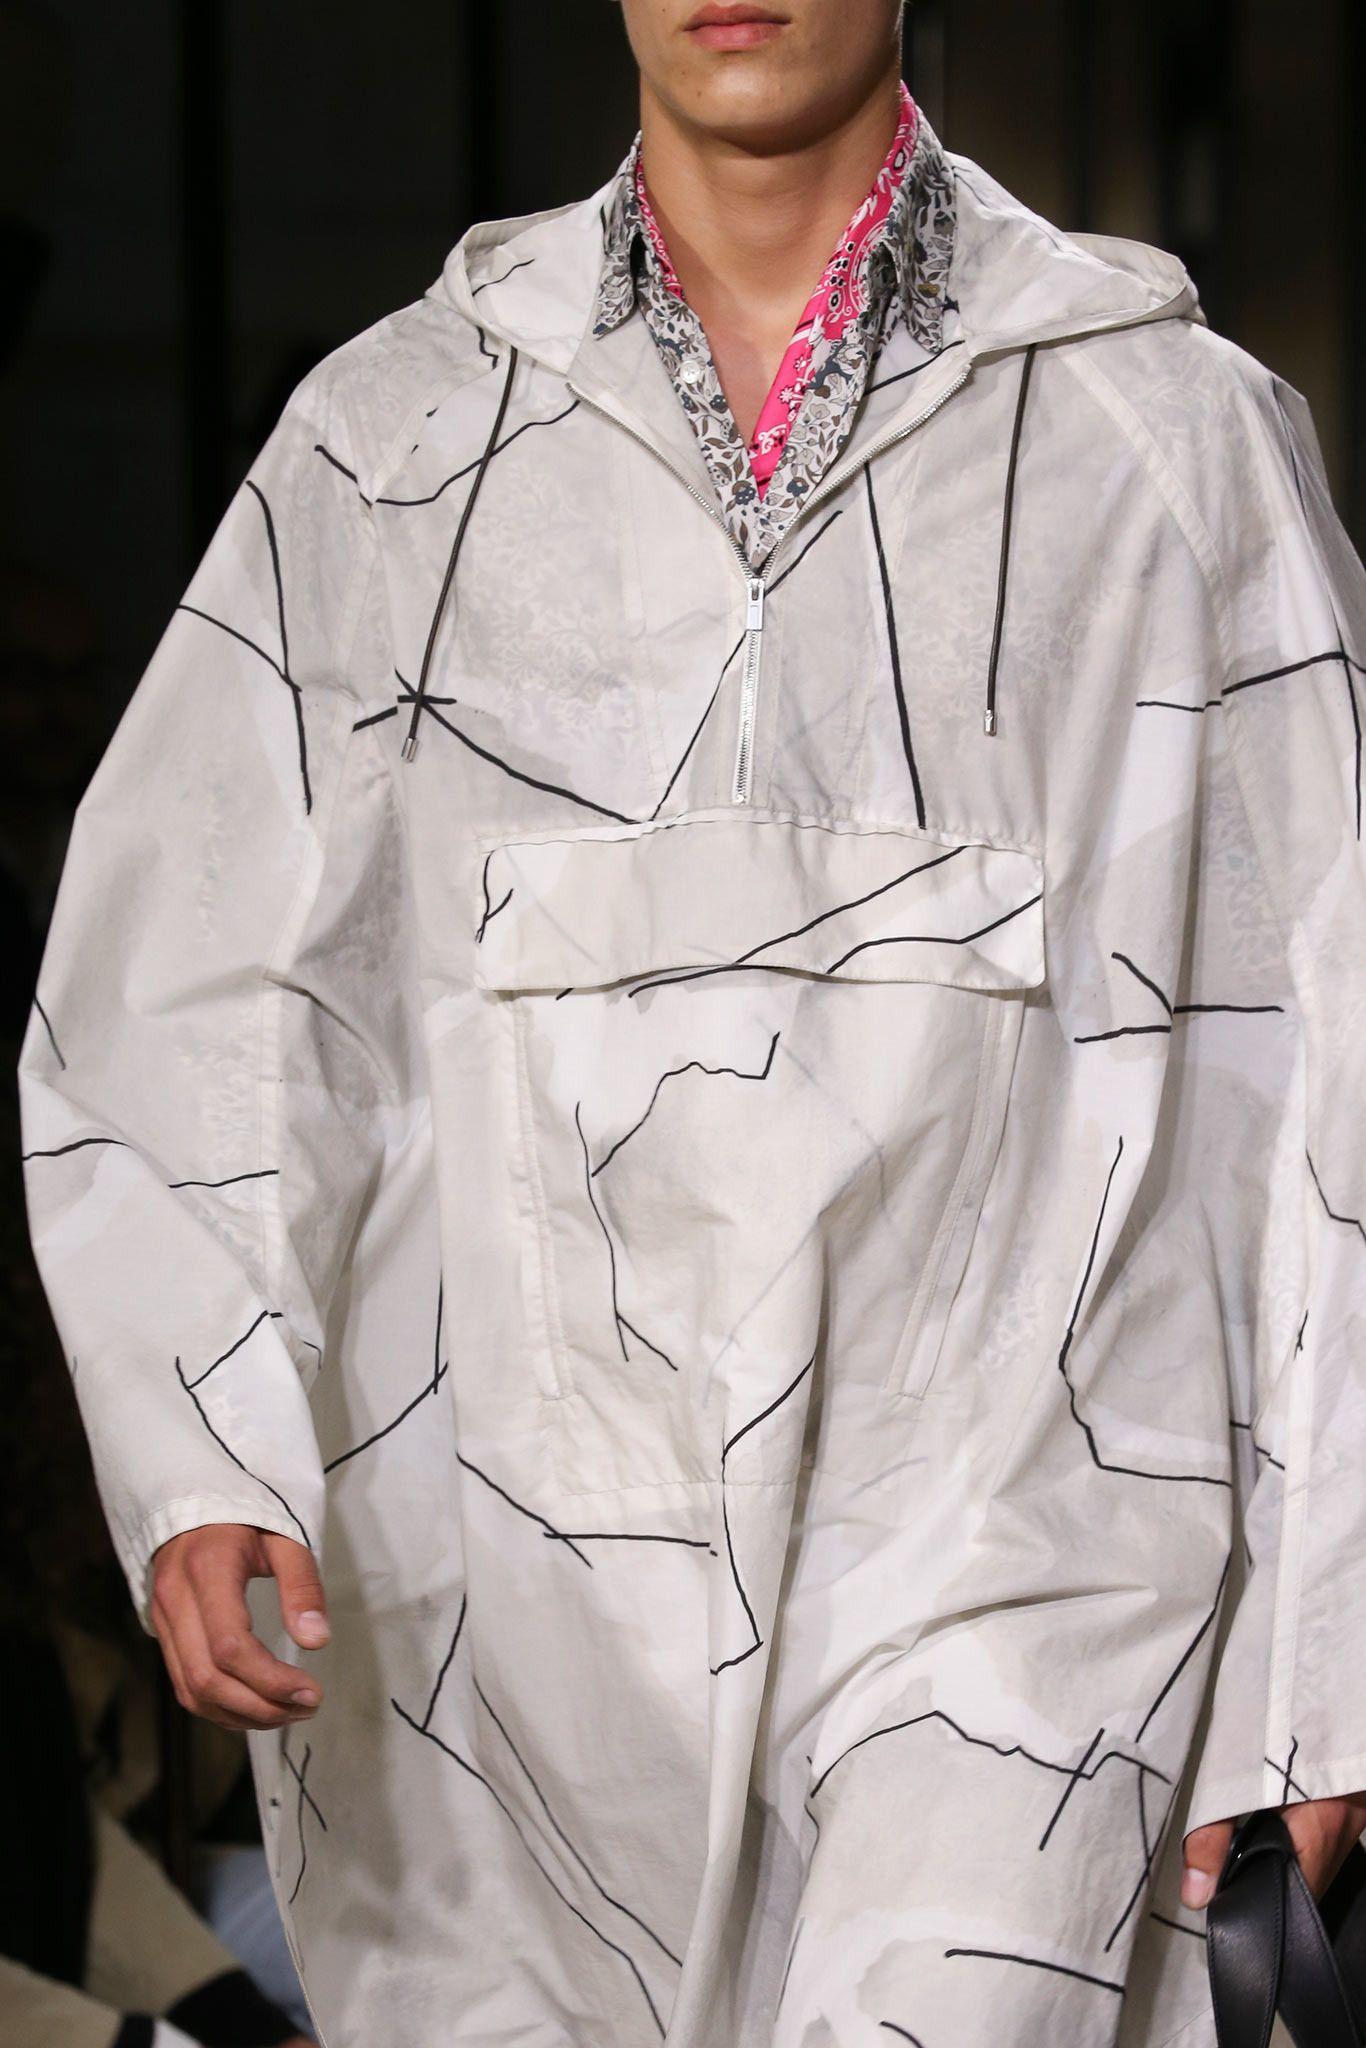 c1294b9505 Hermès Spring 2015 Menswear - Collection - Gallery - Style.com ...